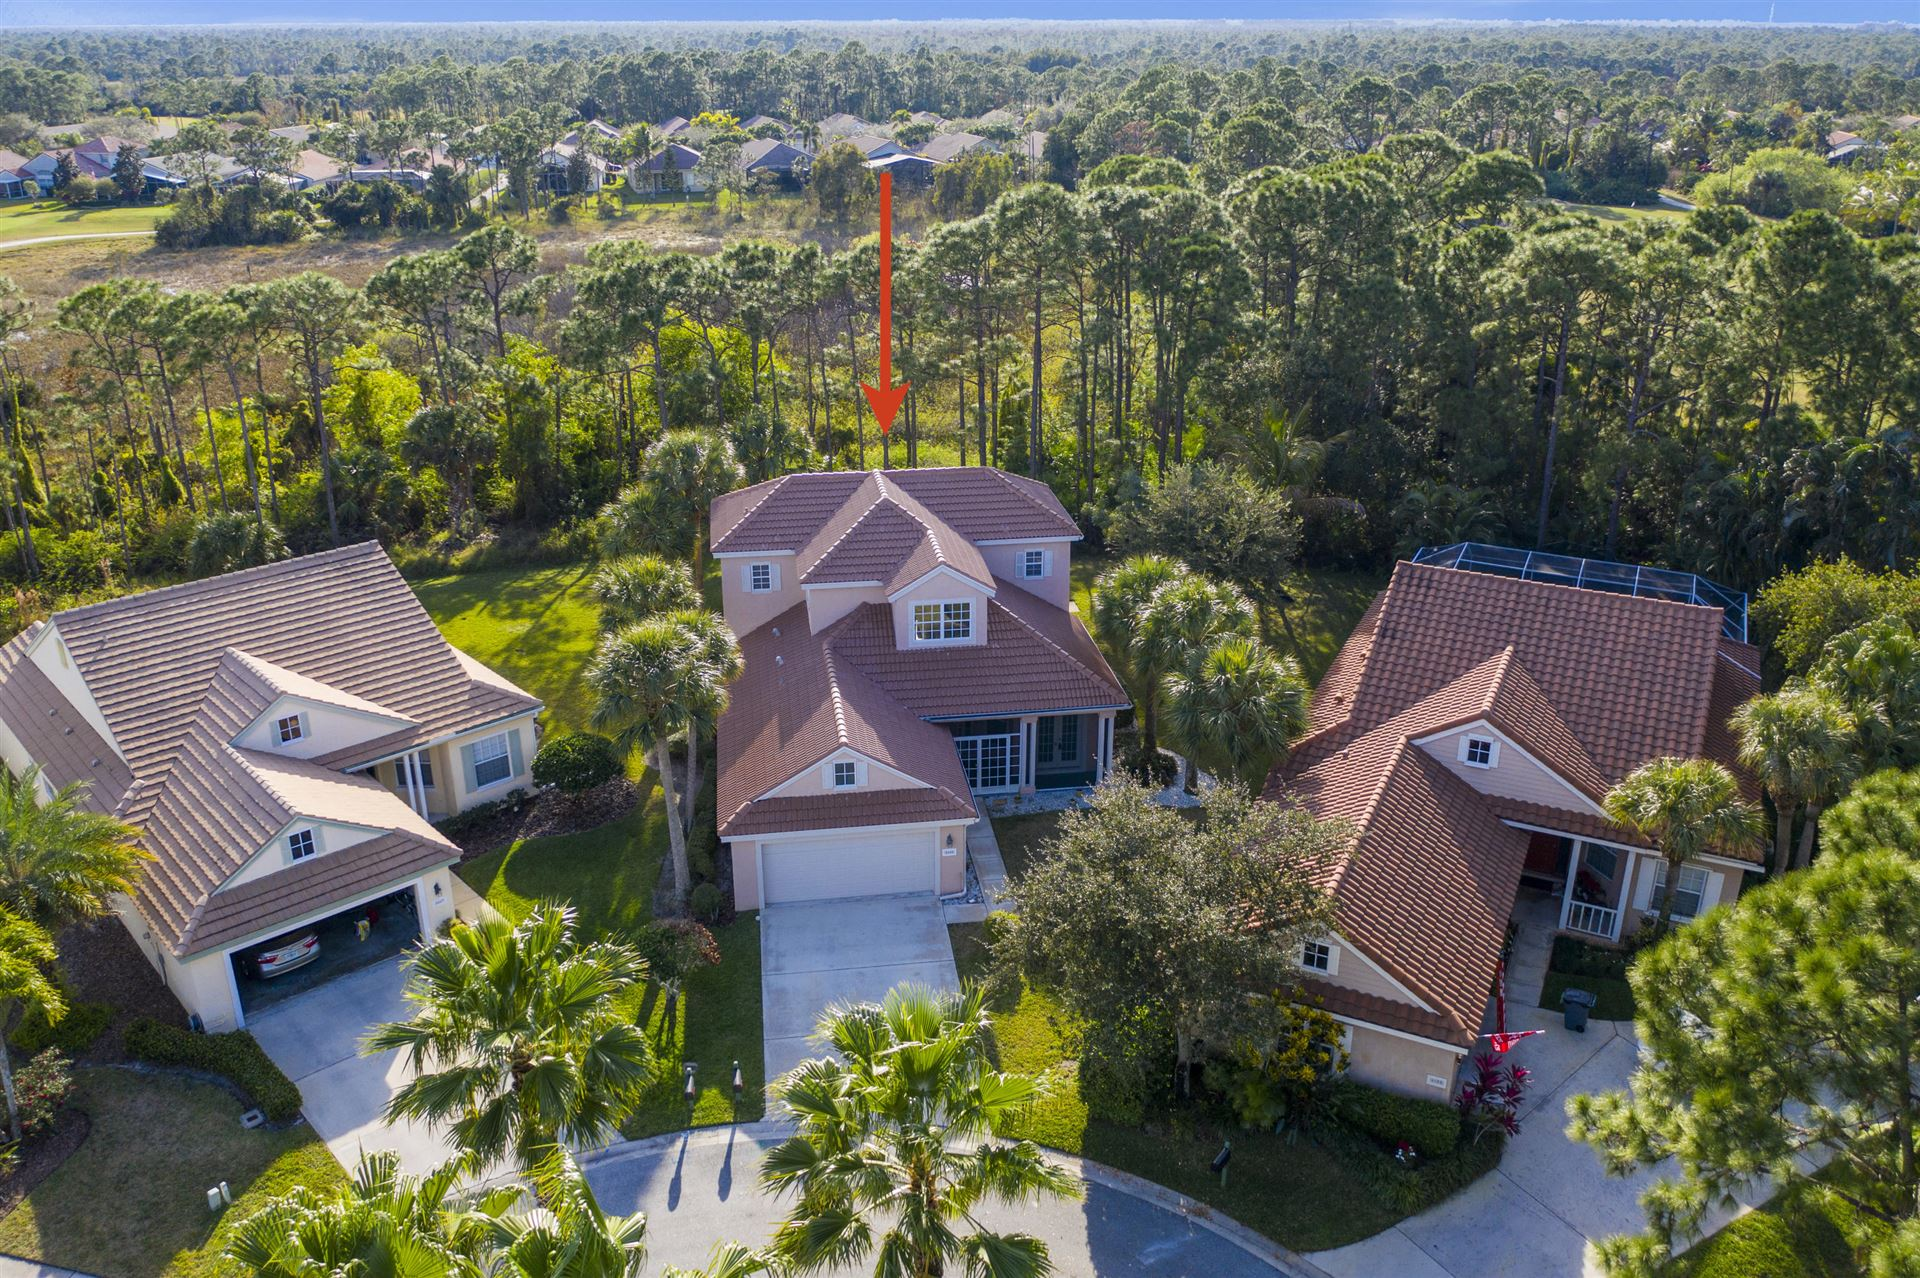 6666 SE Seven Oaks Lane, Stuart, FL 34997 - #: RX-10685644